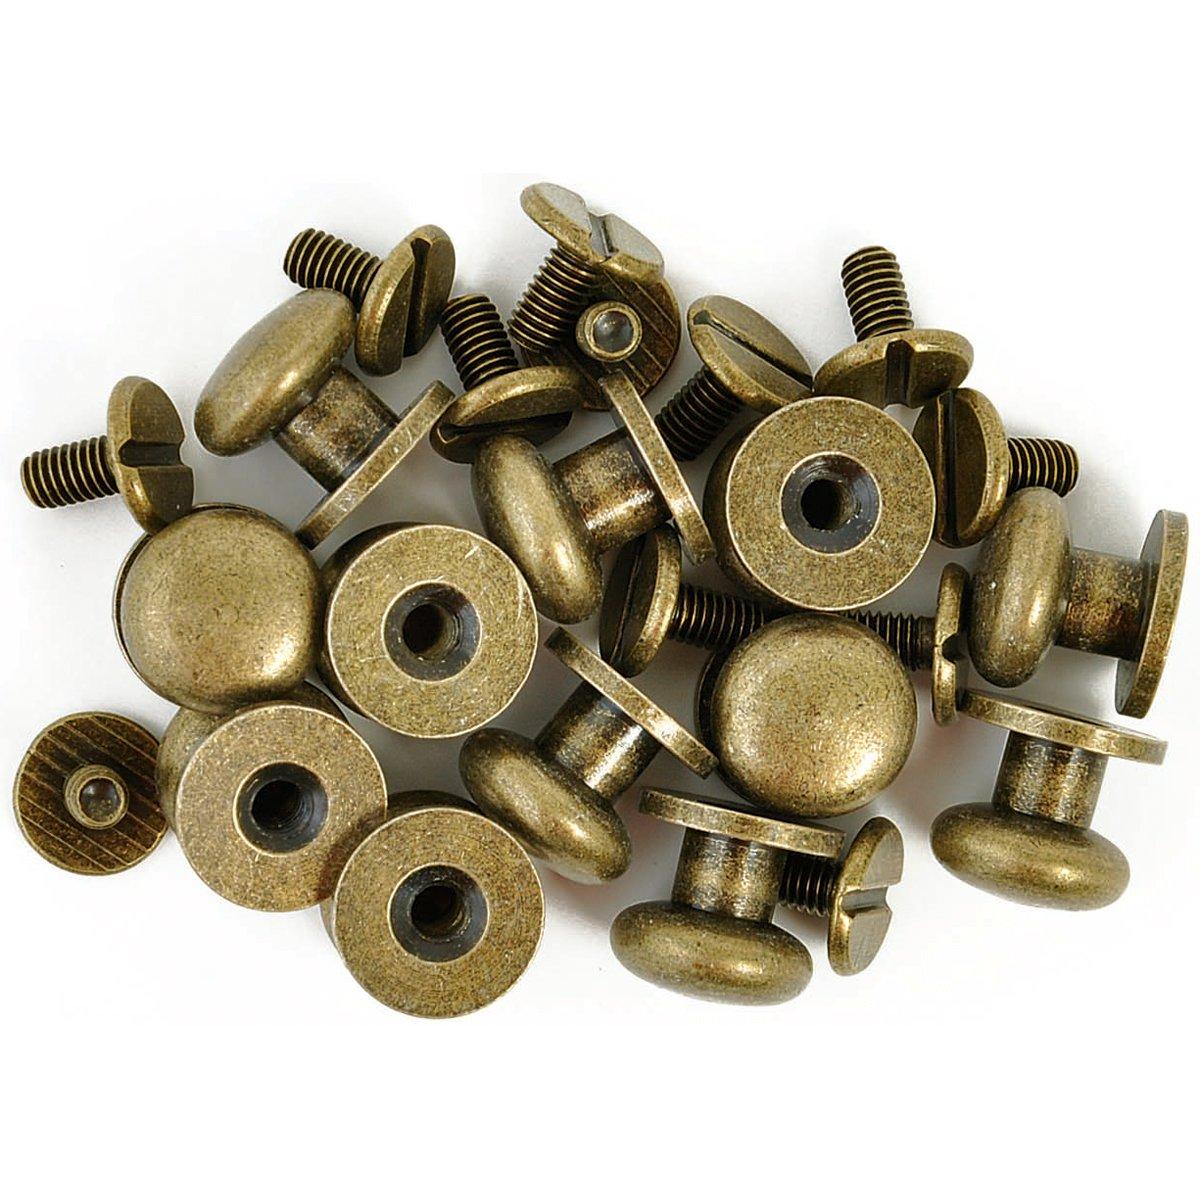 KAISM Treasures-Pomello per cassetto in metallo, 0,95 in ottone antico Kaisercraft cm 0,375 12 pezzi